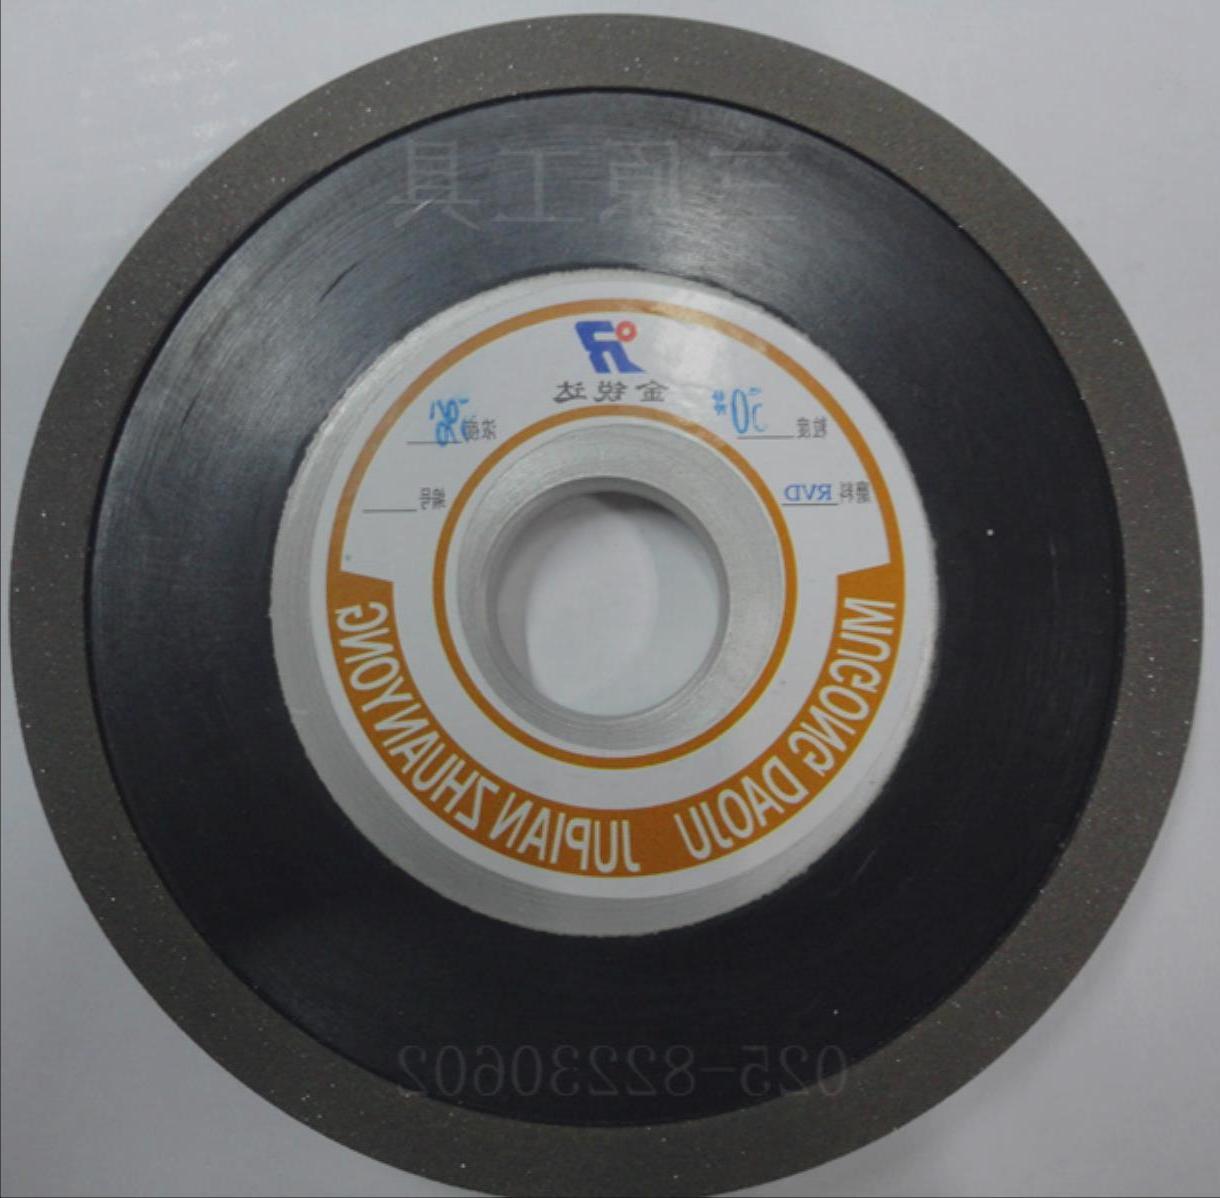 Steel angle grinder slice kingrad diamond wheel single bevel hard alloy cutter blade grinding wheel tooth tungsten